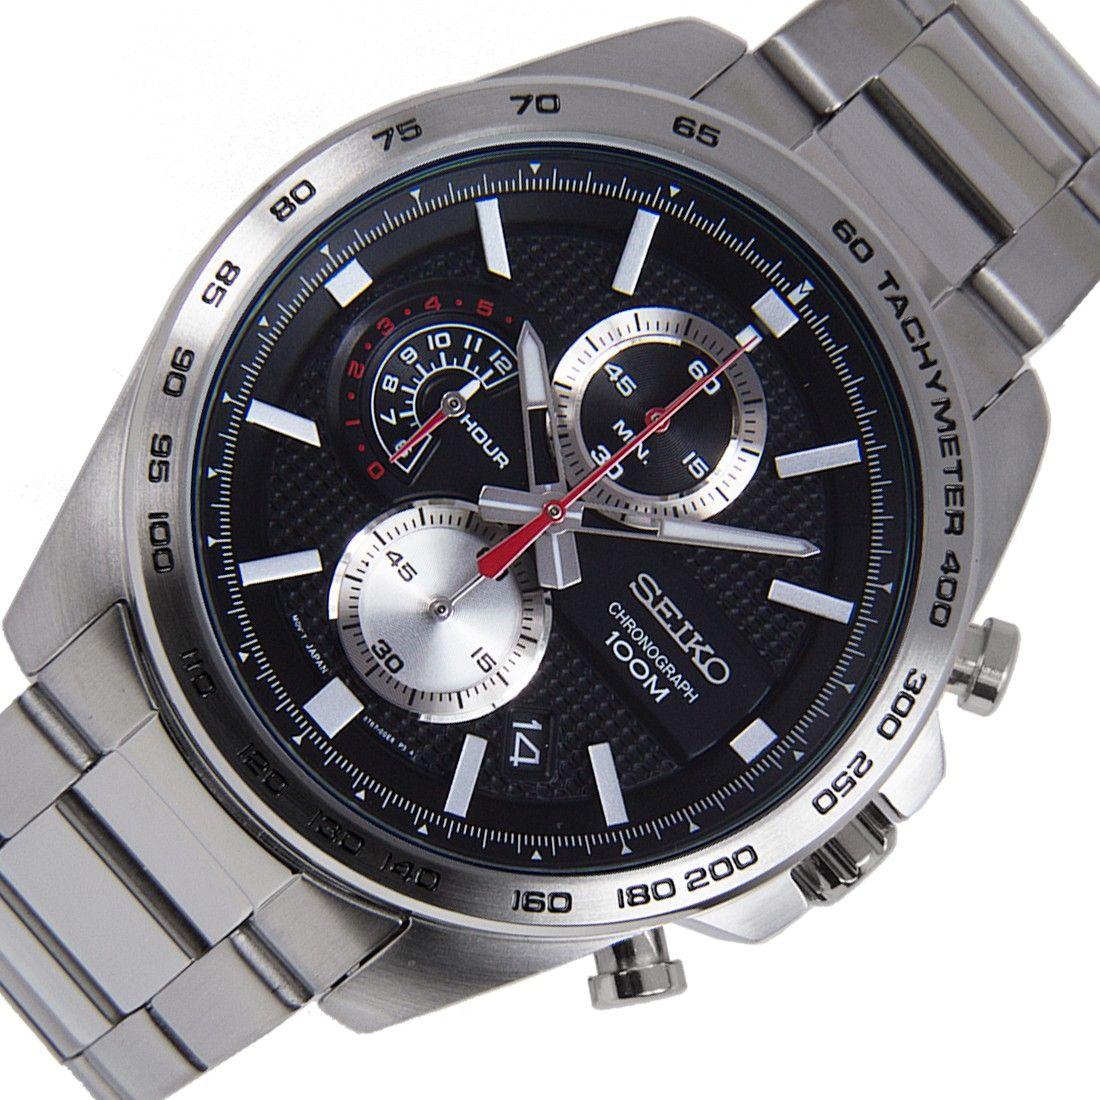 Đồng hồ Seiko Chronograph SSB255P1 cho nam 3